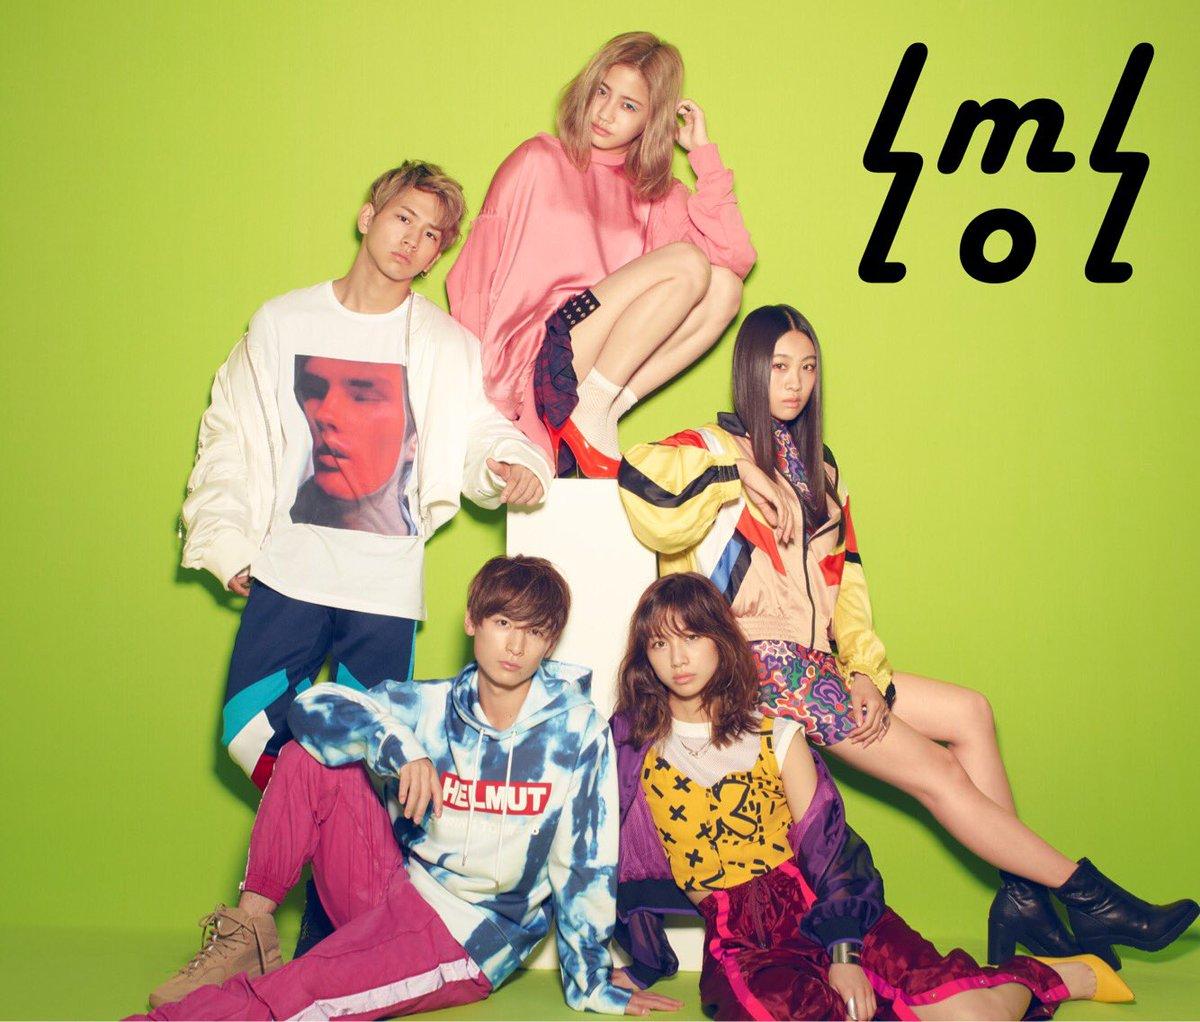 "Lol (Laugh Out Loud) >> Single ""season of Sayonara/Lolli-lolli"" - Página 3 DpW-icnV4AA2SPJ"